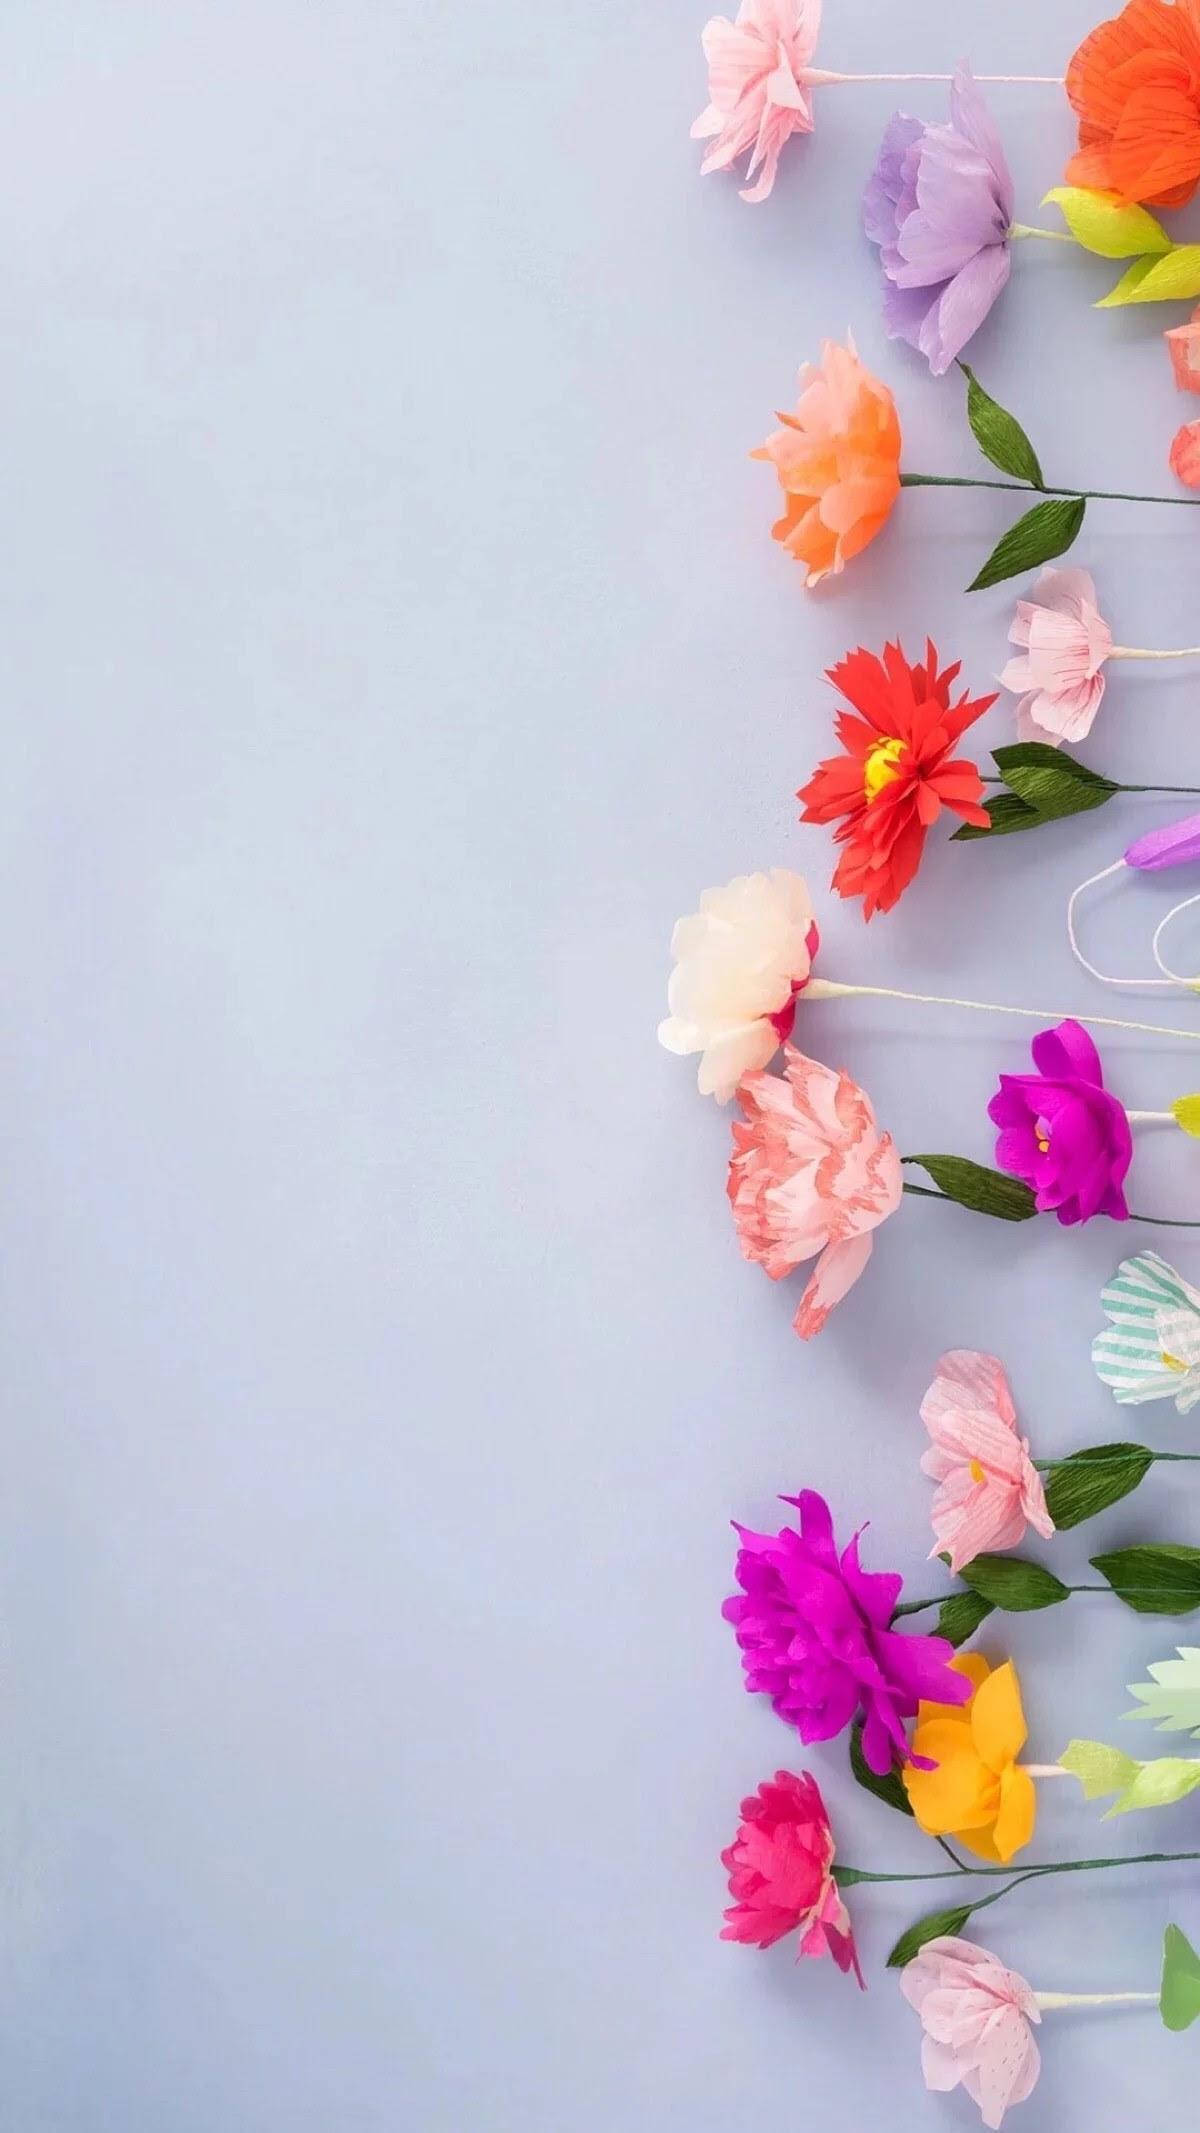 Unduh 730 Background Tumblr Flower HD Gratis